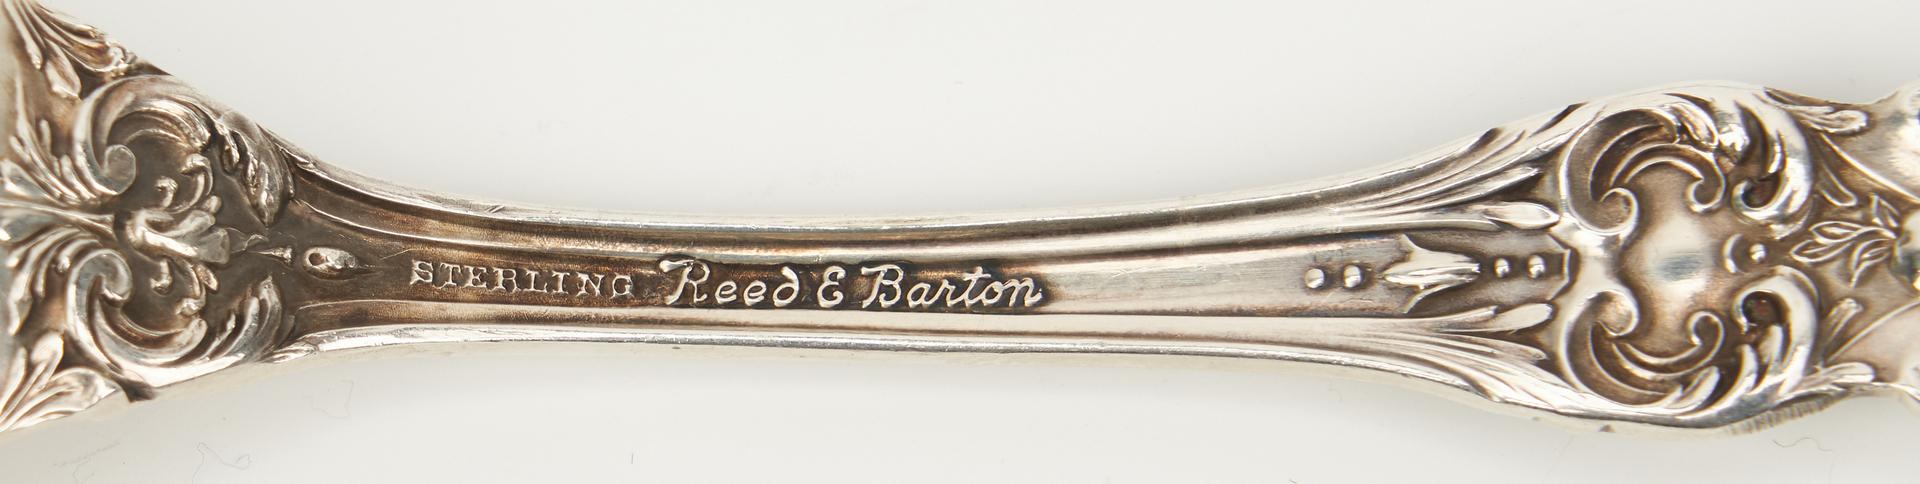 Lot 240: 53 Pcs. Reed & Barton Burgundy Sterling Flatware